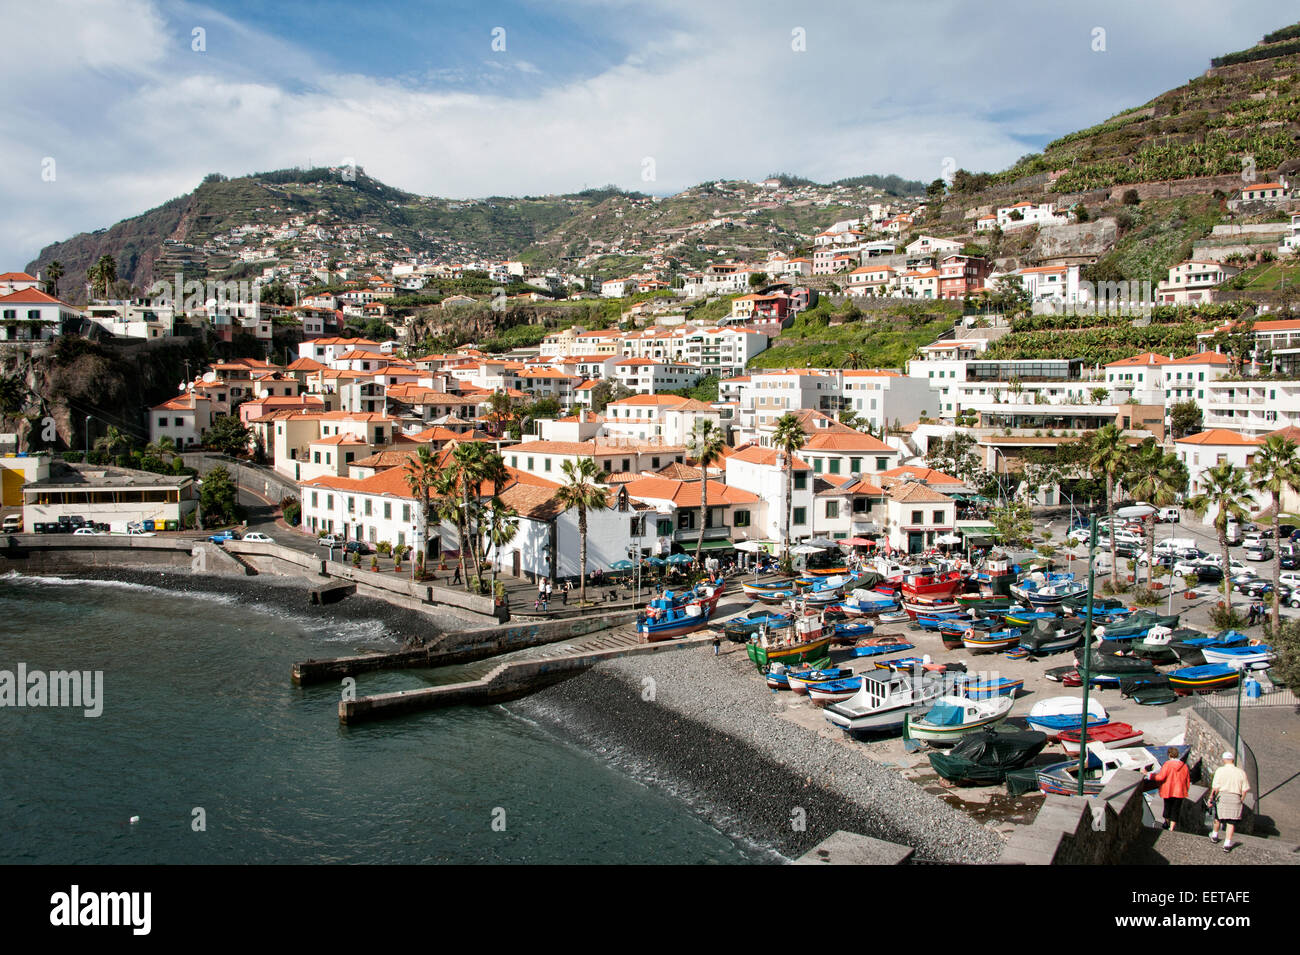 Reisen, Europa, Portugal, Madeira; Hafen mit bunten Fischerbooten in Camara de Lobos. - Stock Image